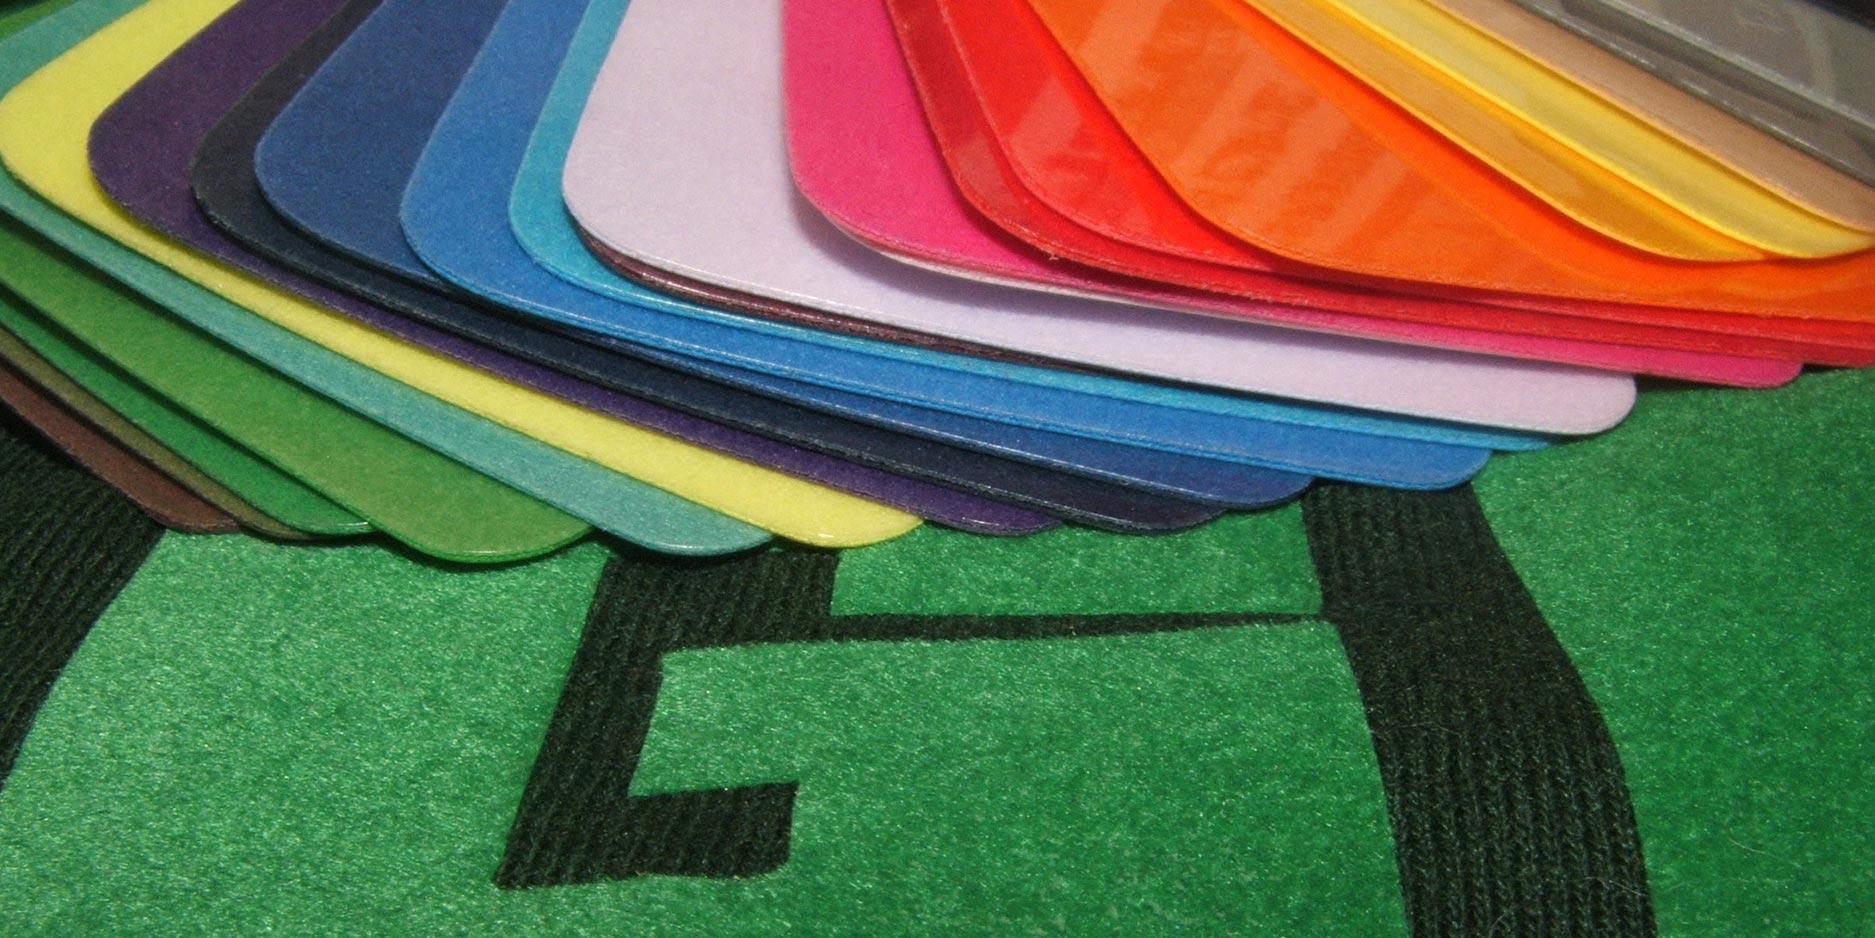 Flock- Textil - Películas Emulsionadas de Transferencia-Screen-Serigrafia - Prisma - Screen Digital - Bogotá